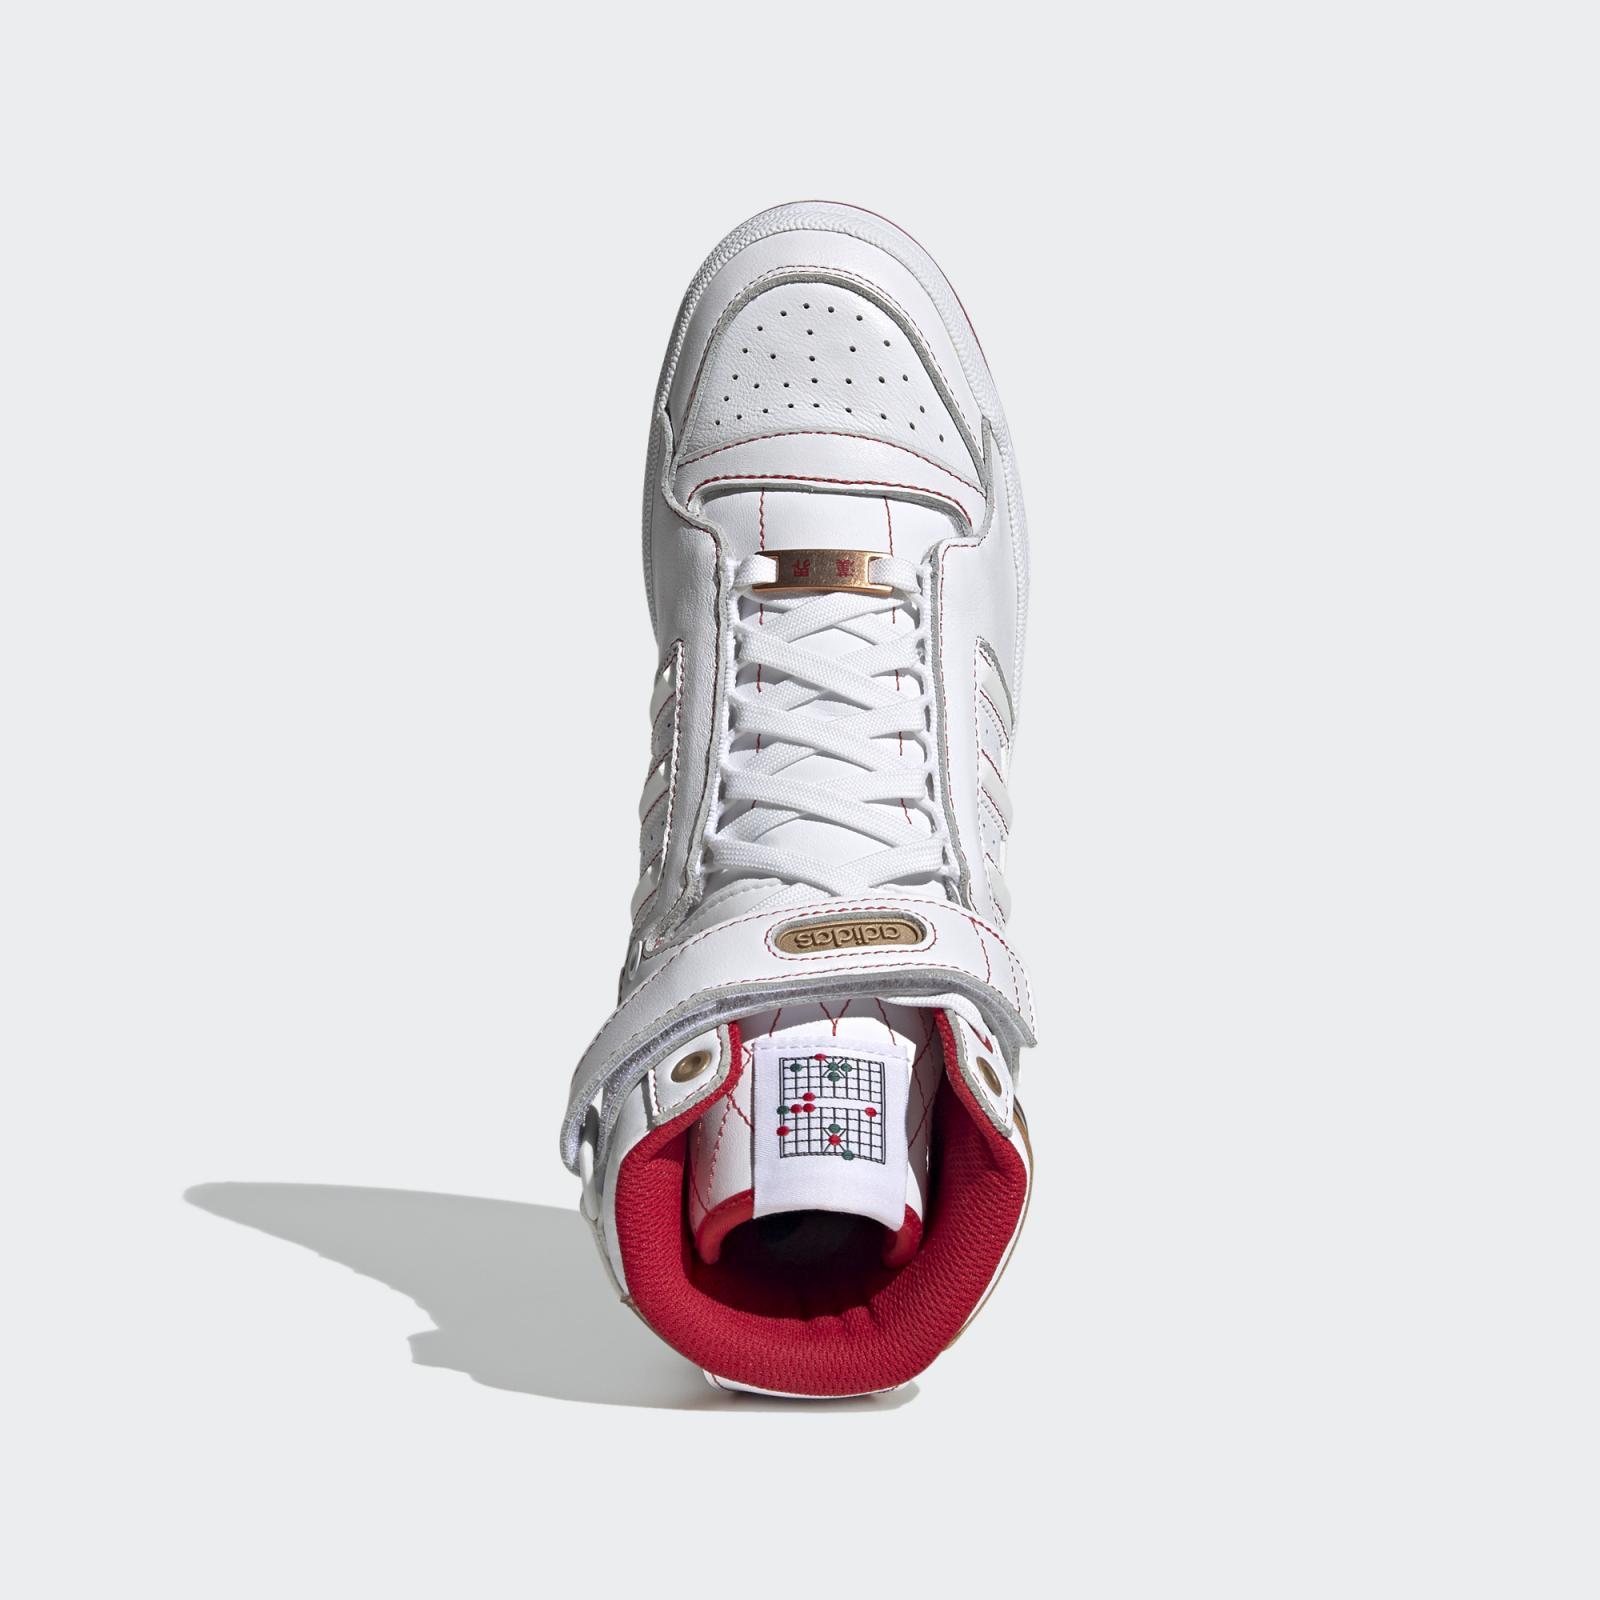 adidas Originals推出全新中国象棋限定白/浅猩红色Forum Hi OG